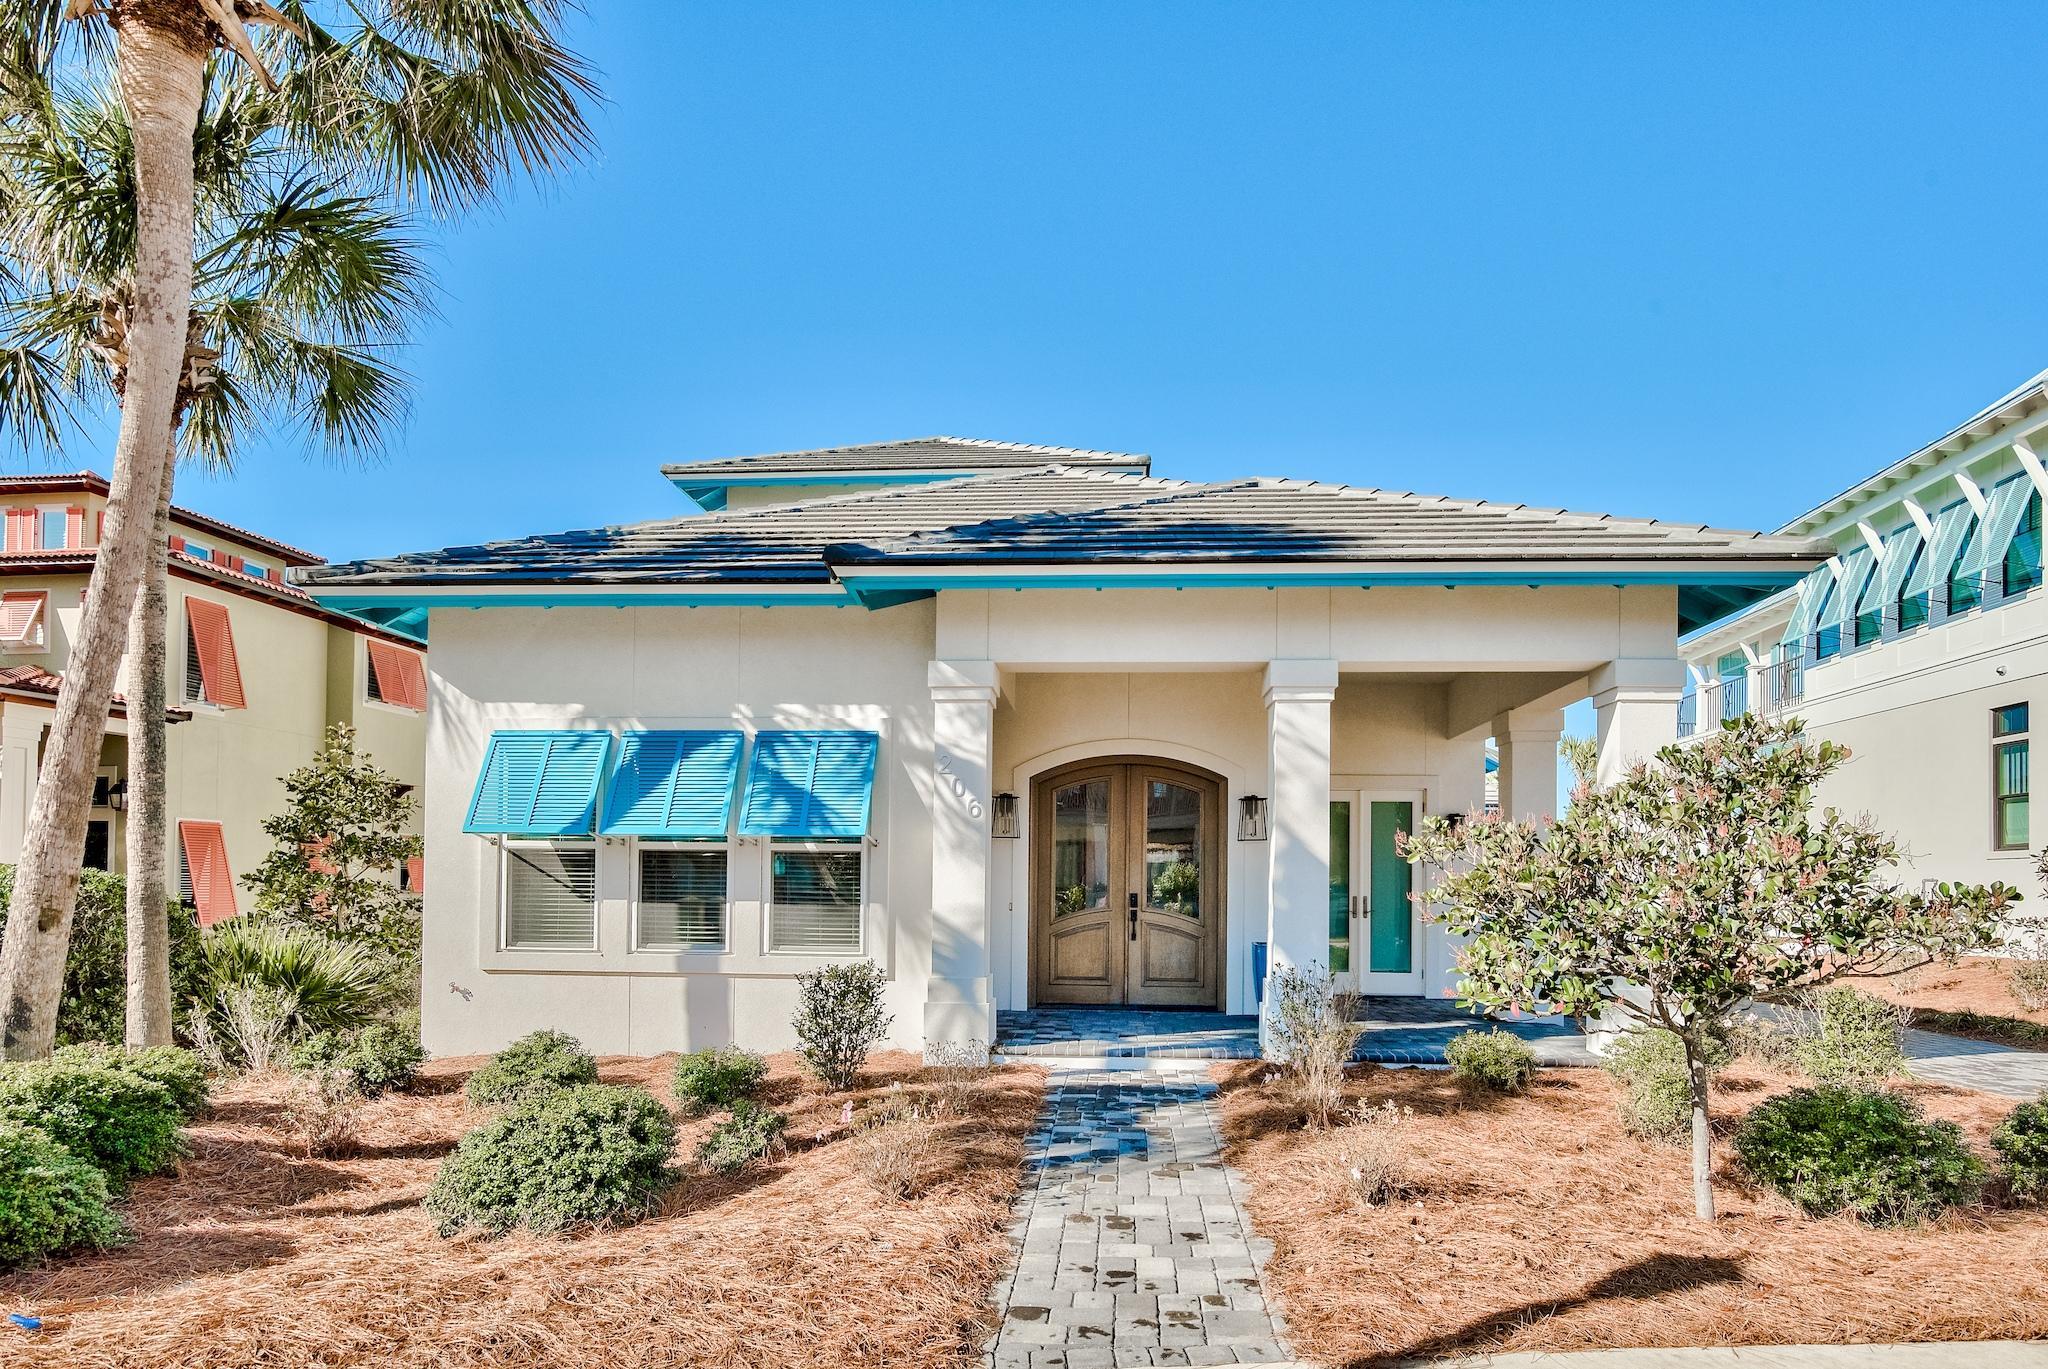 Photo of home for sale at 206 Rue Martine, Miramar Beach FL